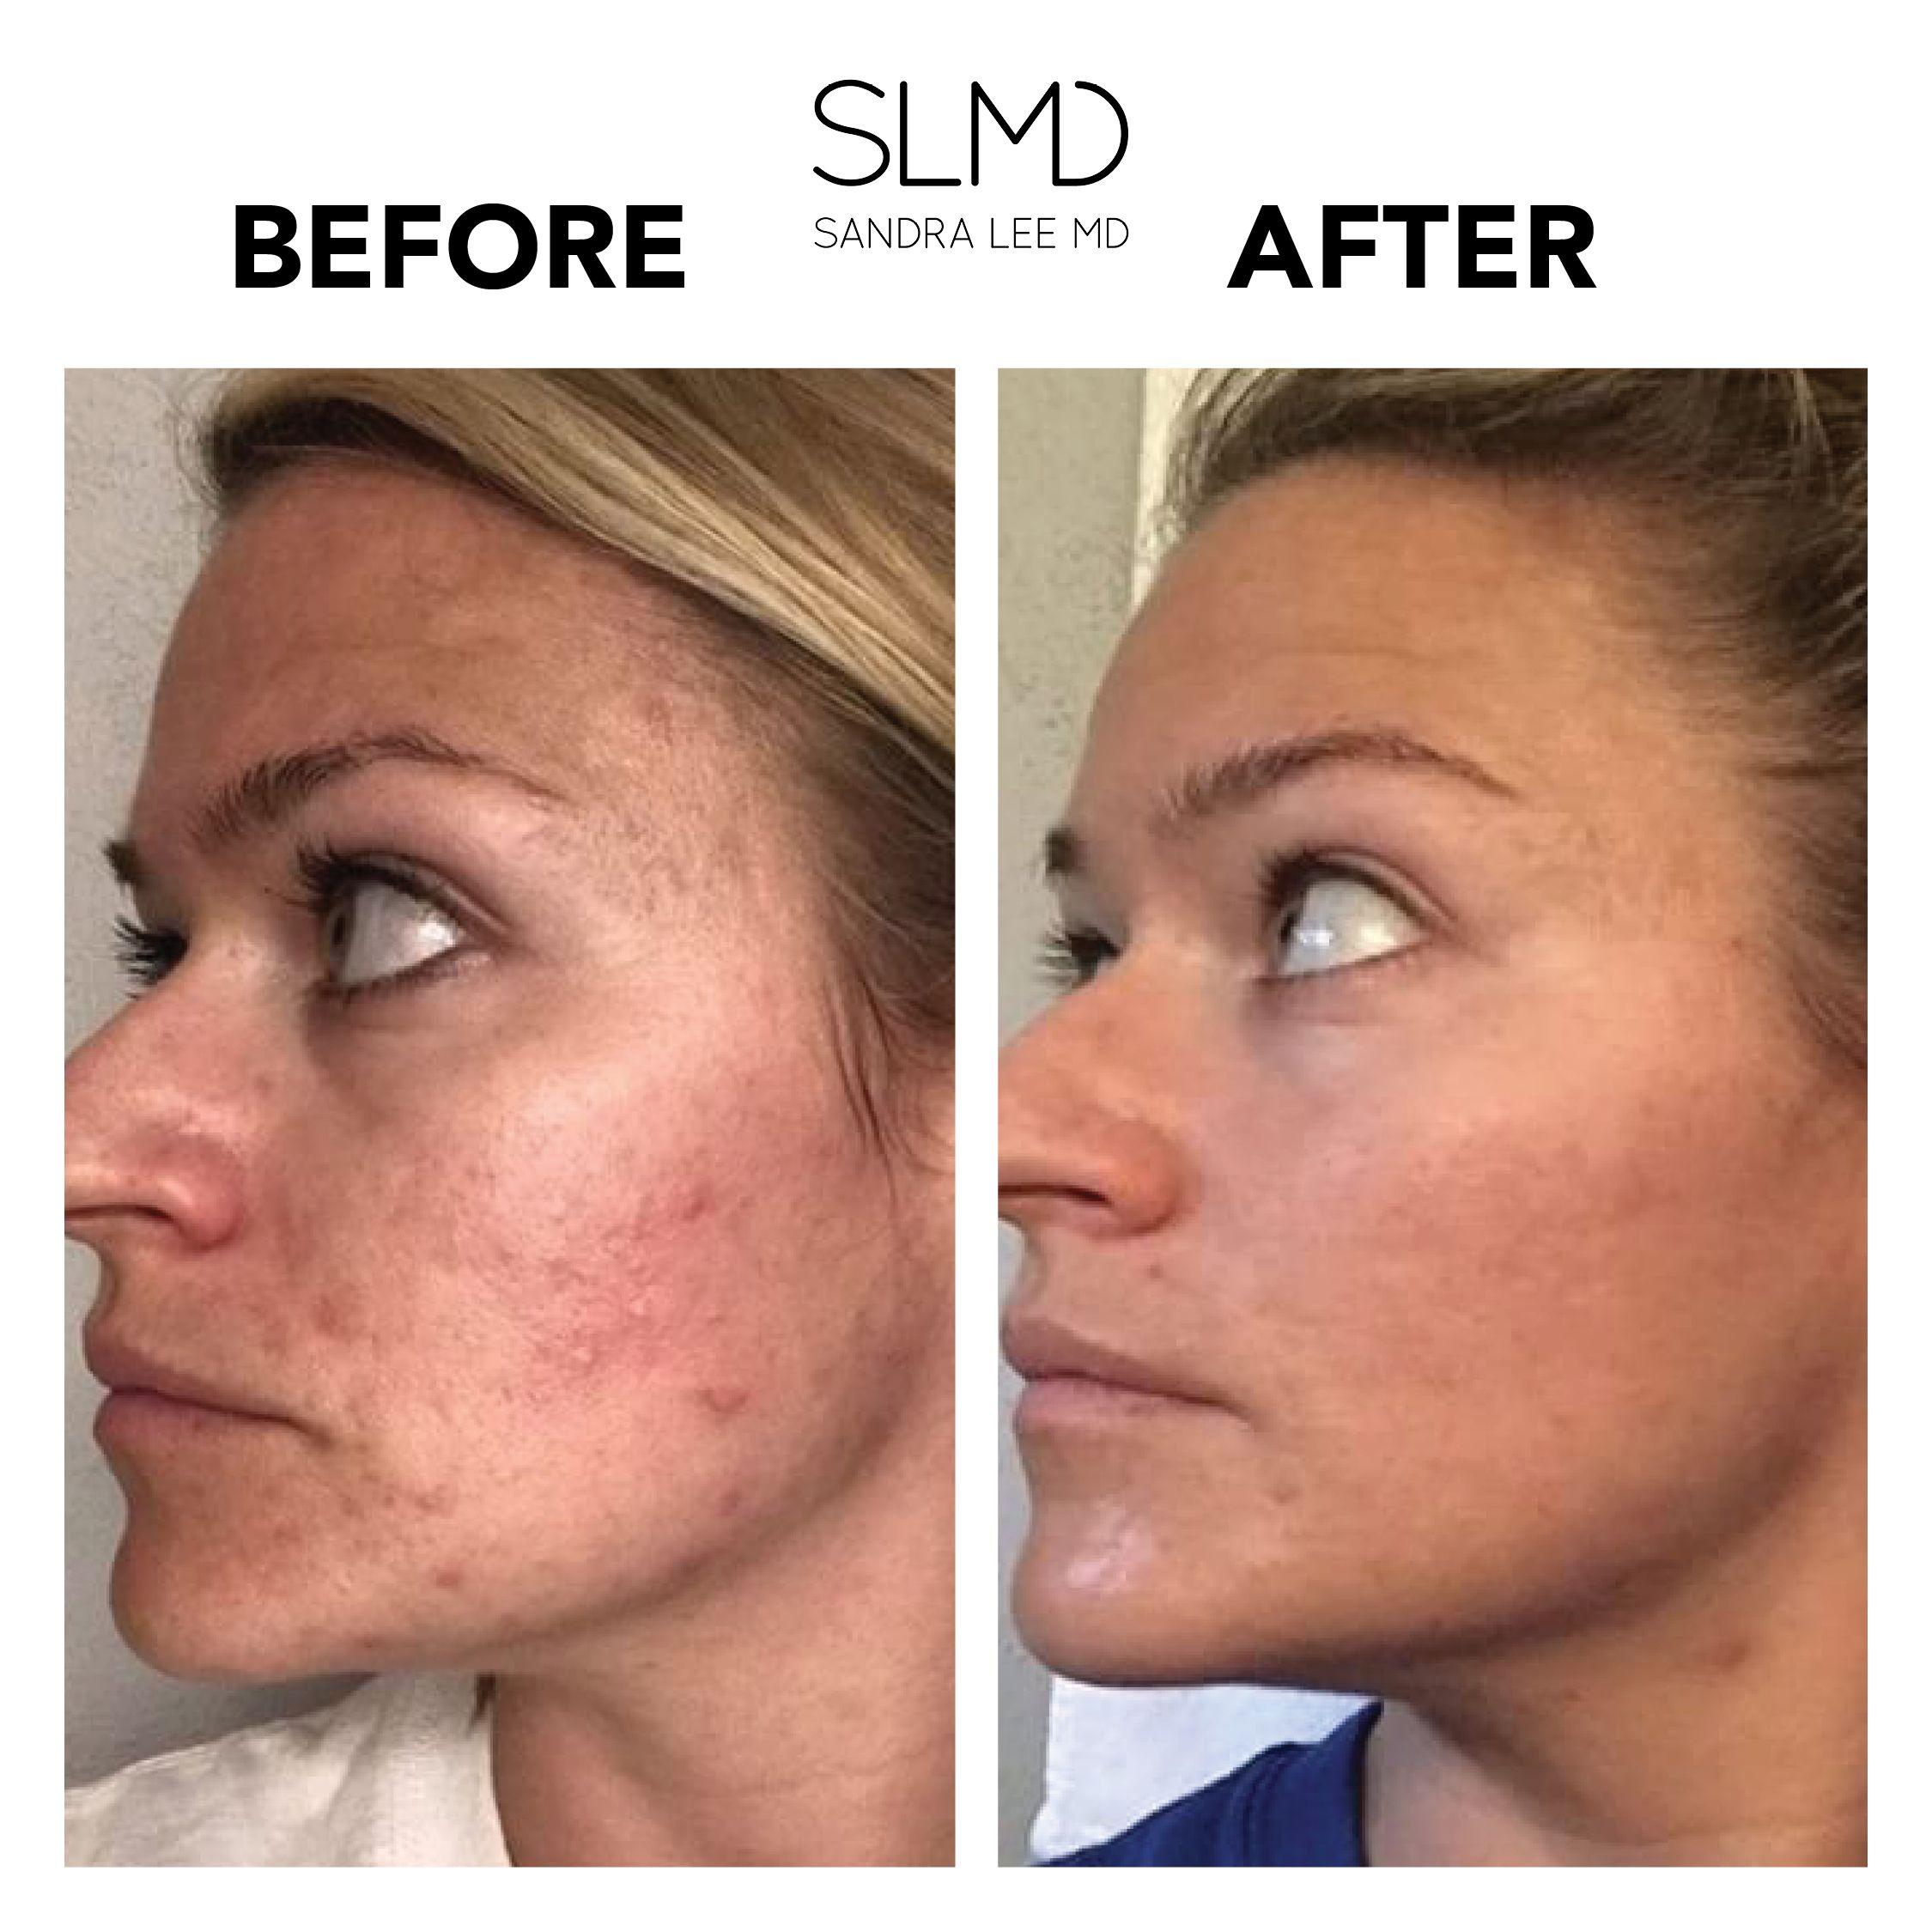 Shop Slmd Skincare Solutions Oily Skin Skin Care Acne